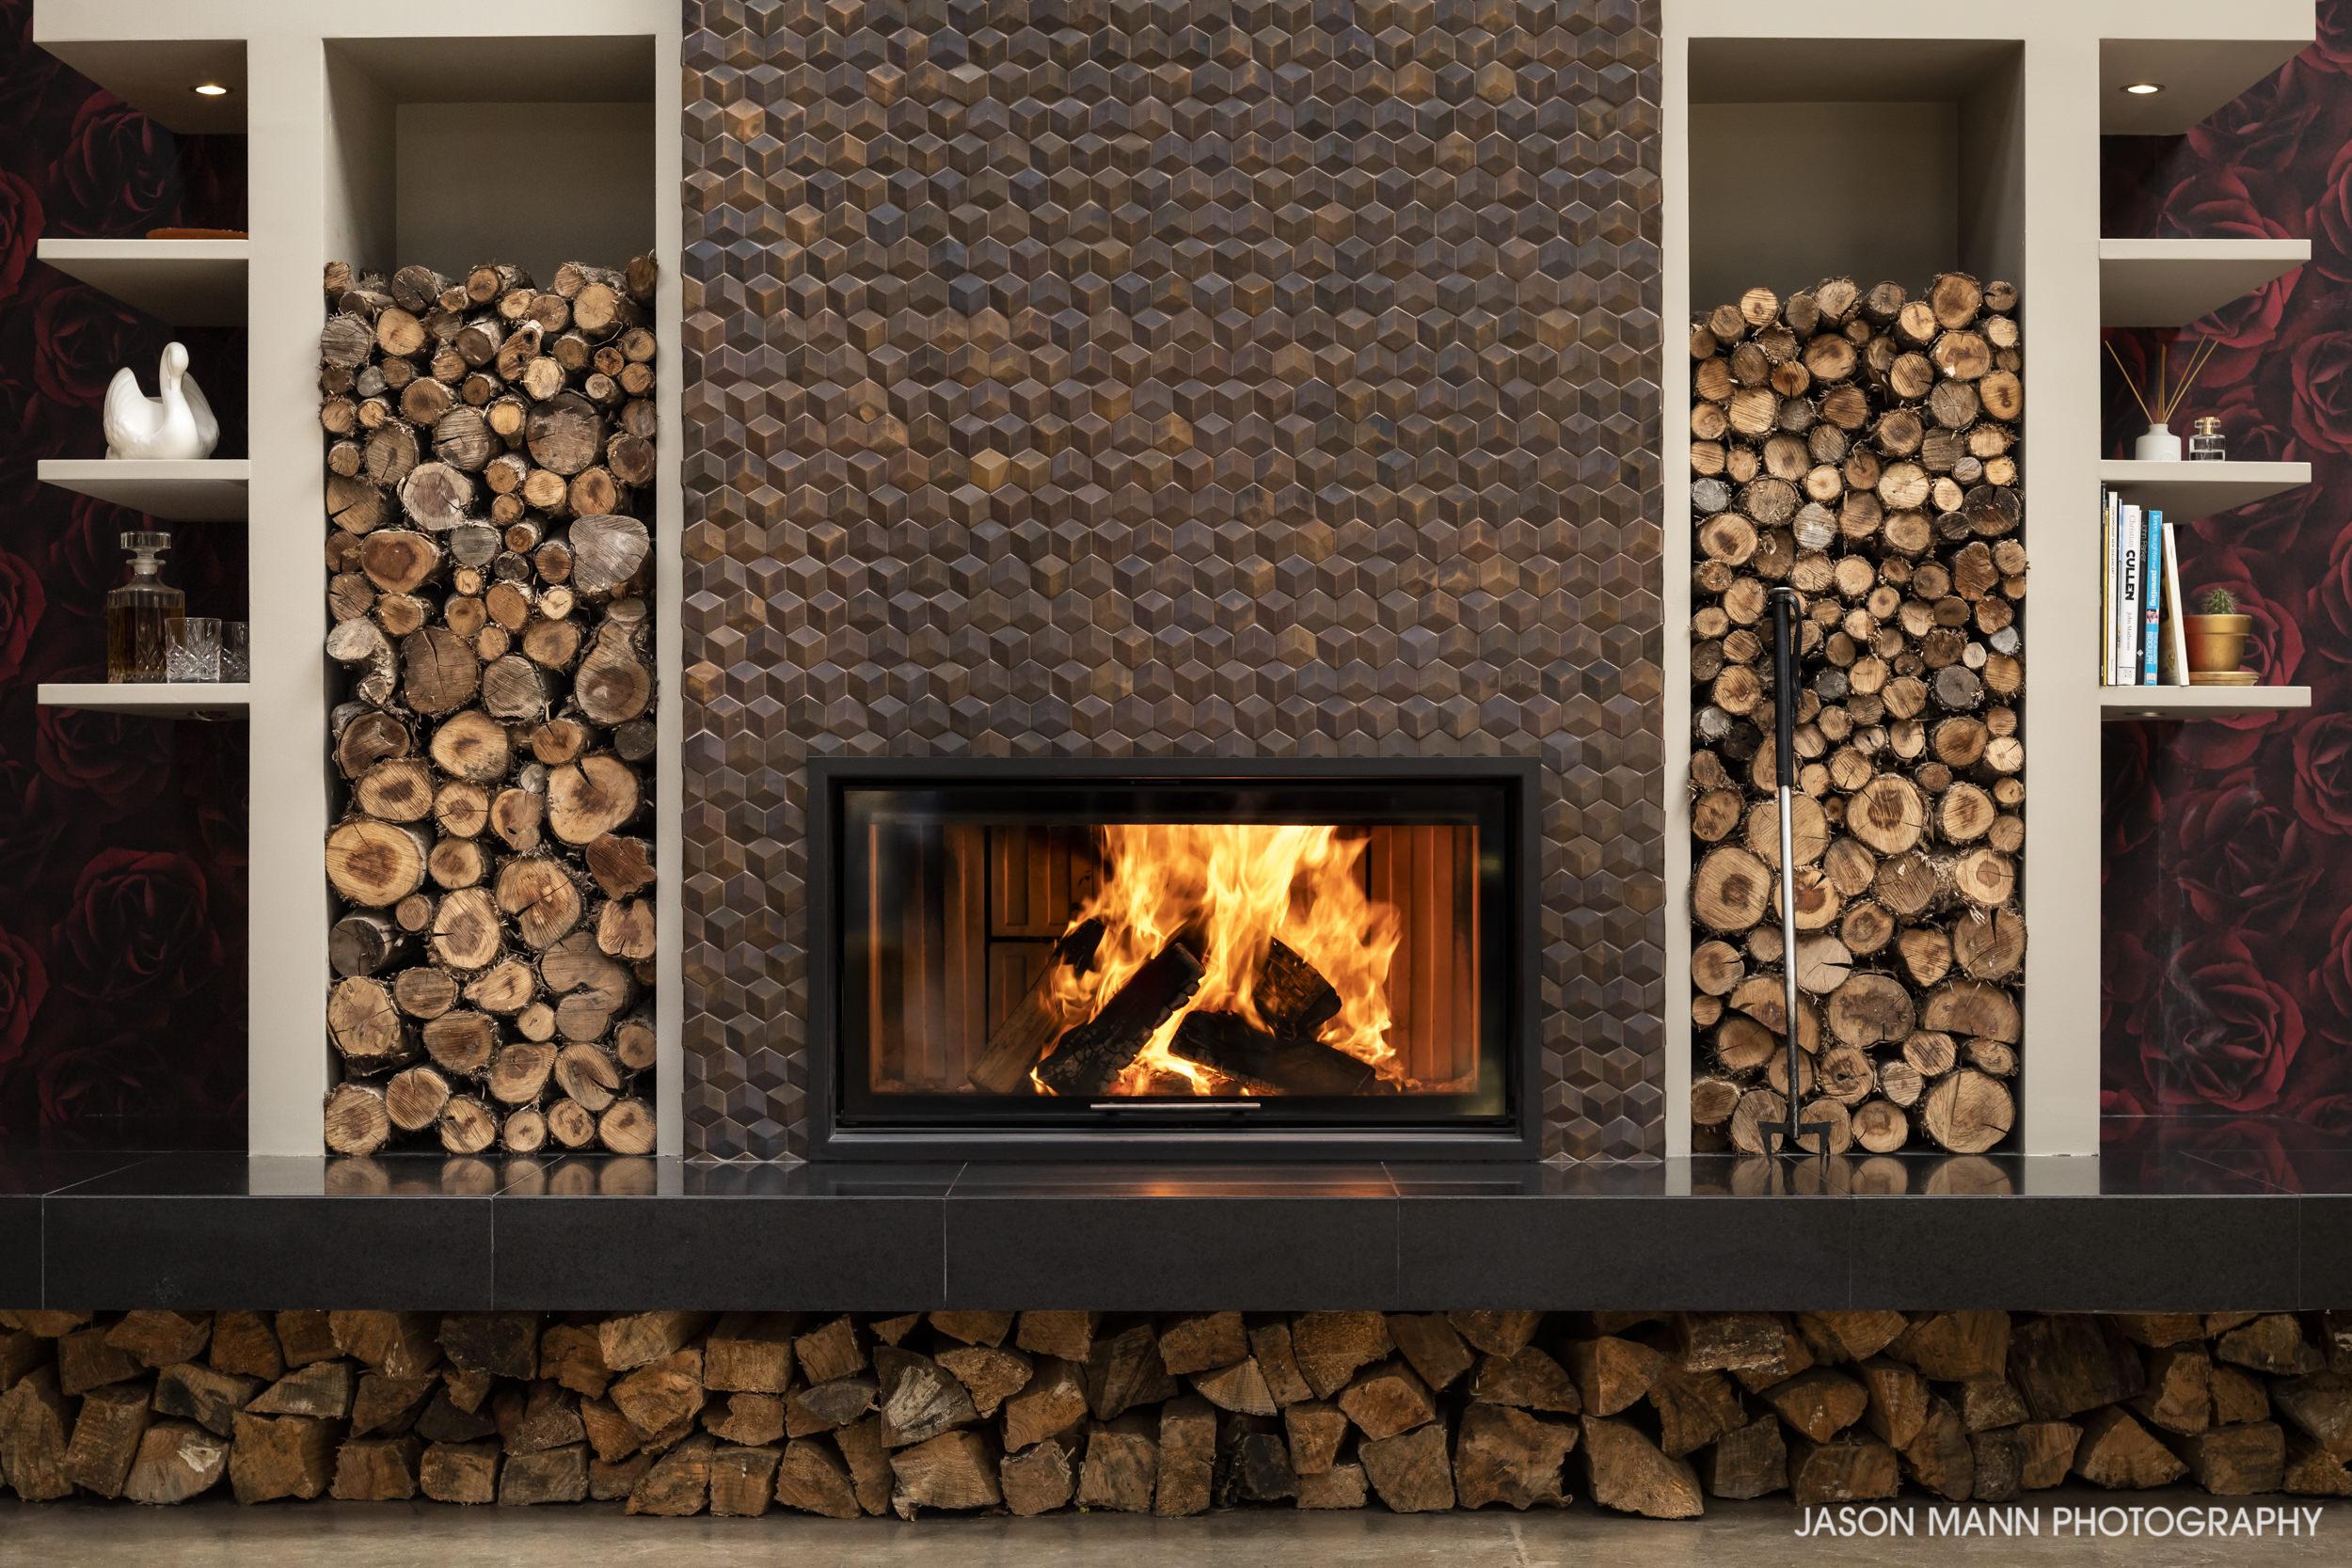 Jason_Mann_Fireplaces_11.jpg